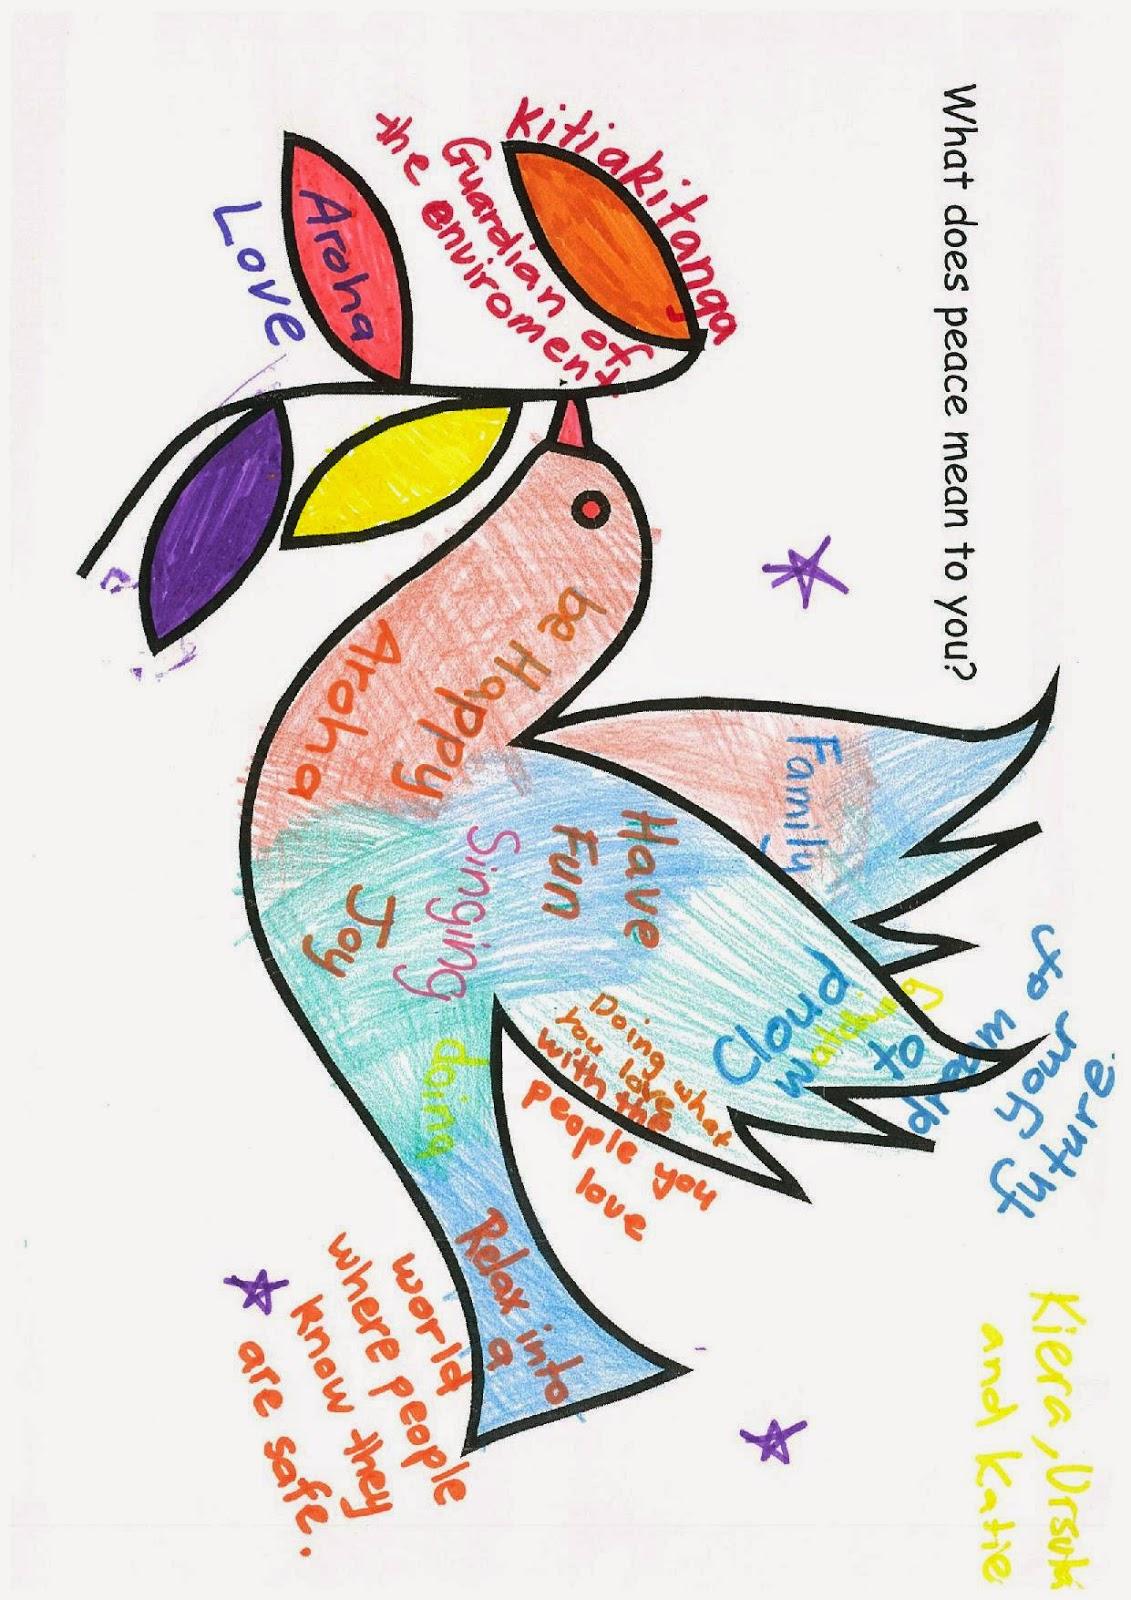 We are One! Arataki 2015: WORLD PEACE PROJECT